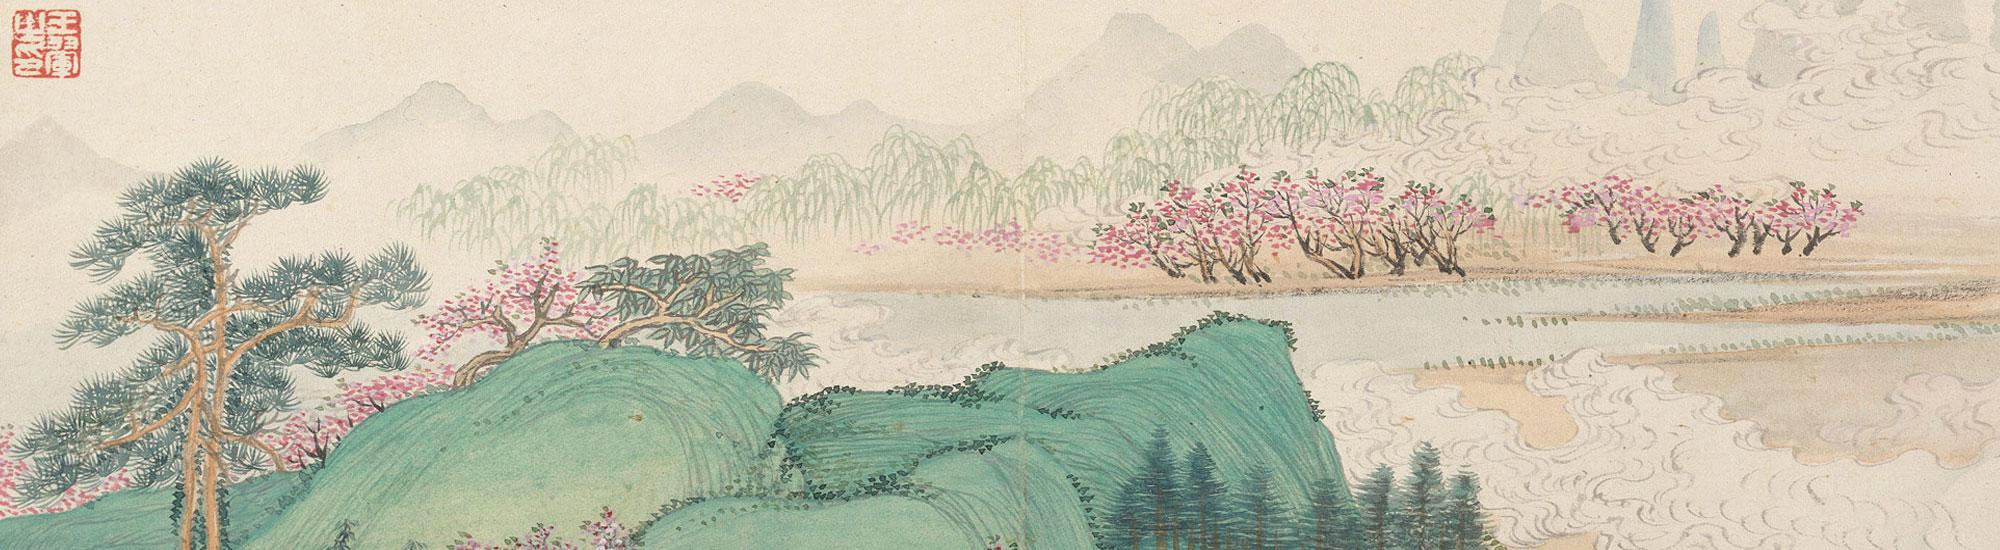 Wang Hui, Landscape after Old Masters, 1674 (detail), Metropolitan Museum